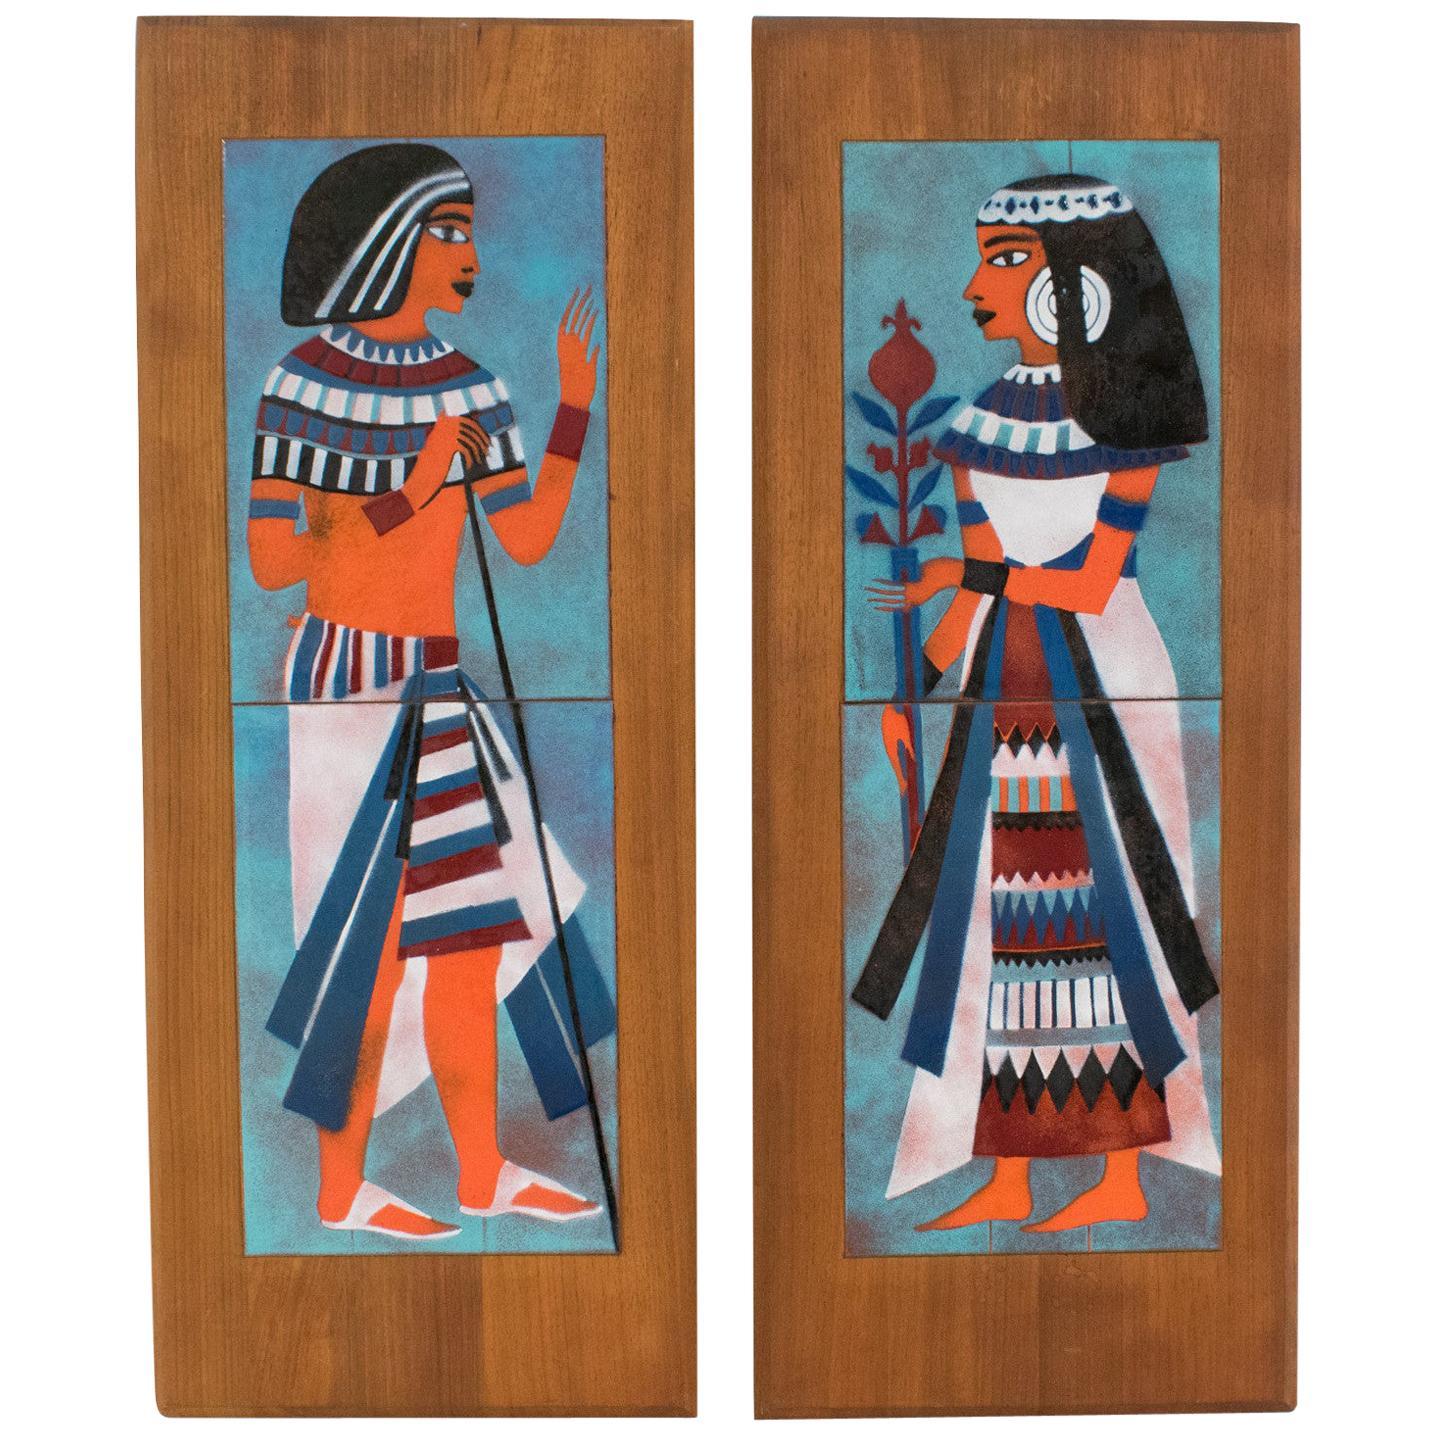 Judith Daner Enamel on Copper Artwork Wall Panel Egyptians, a pair